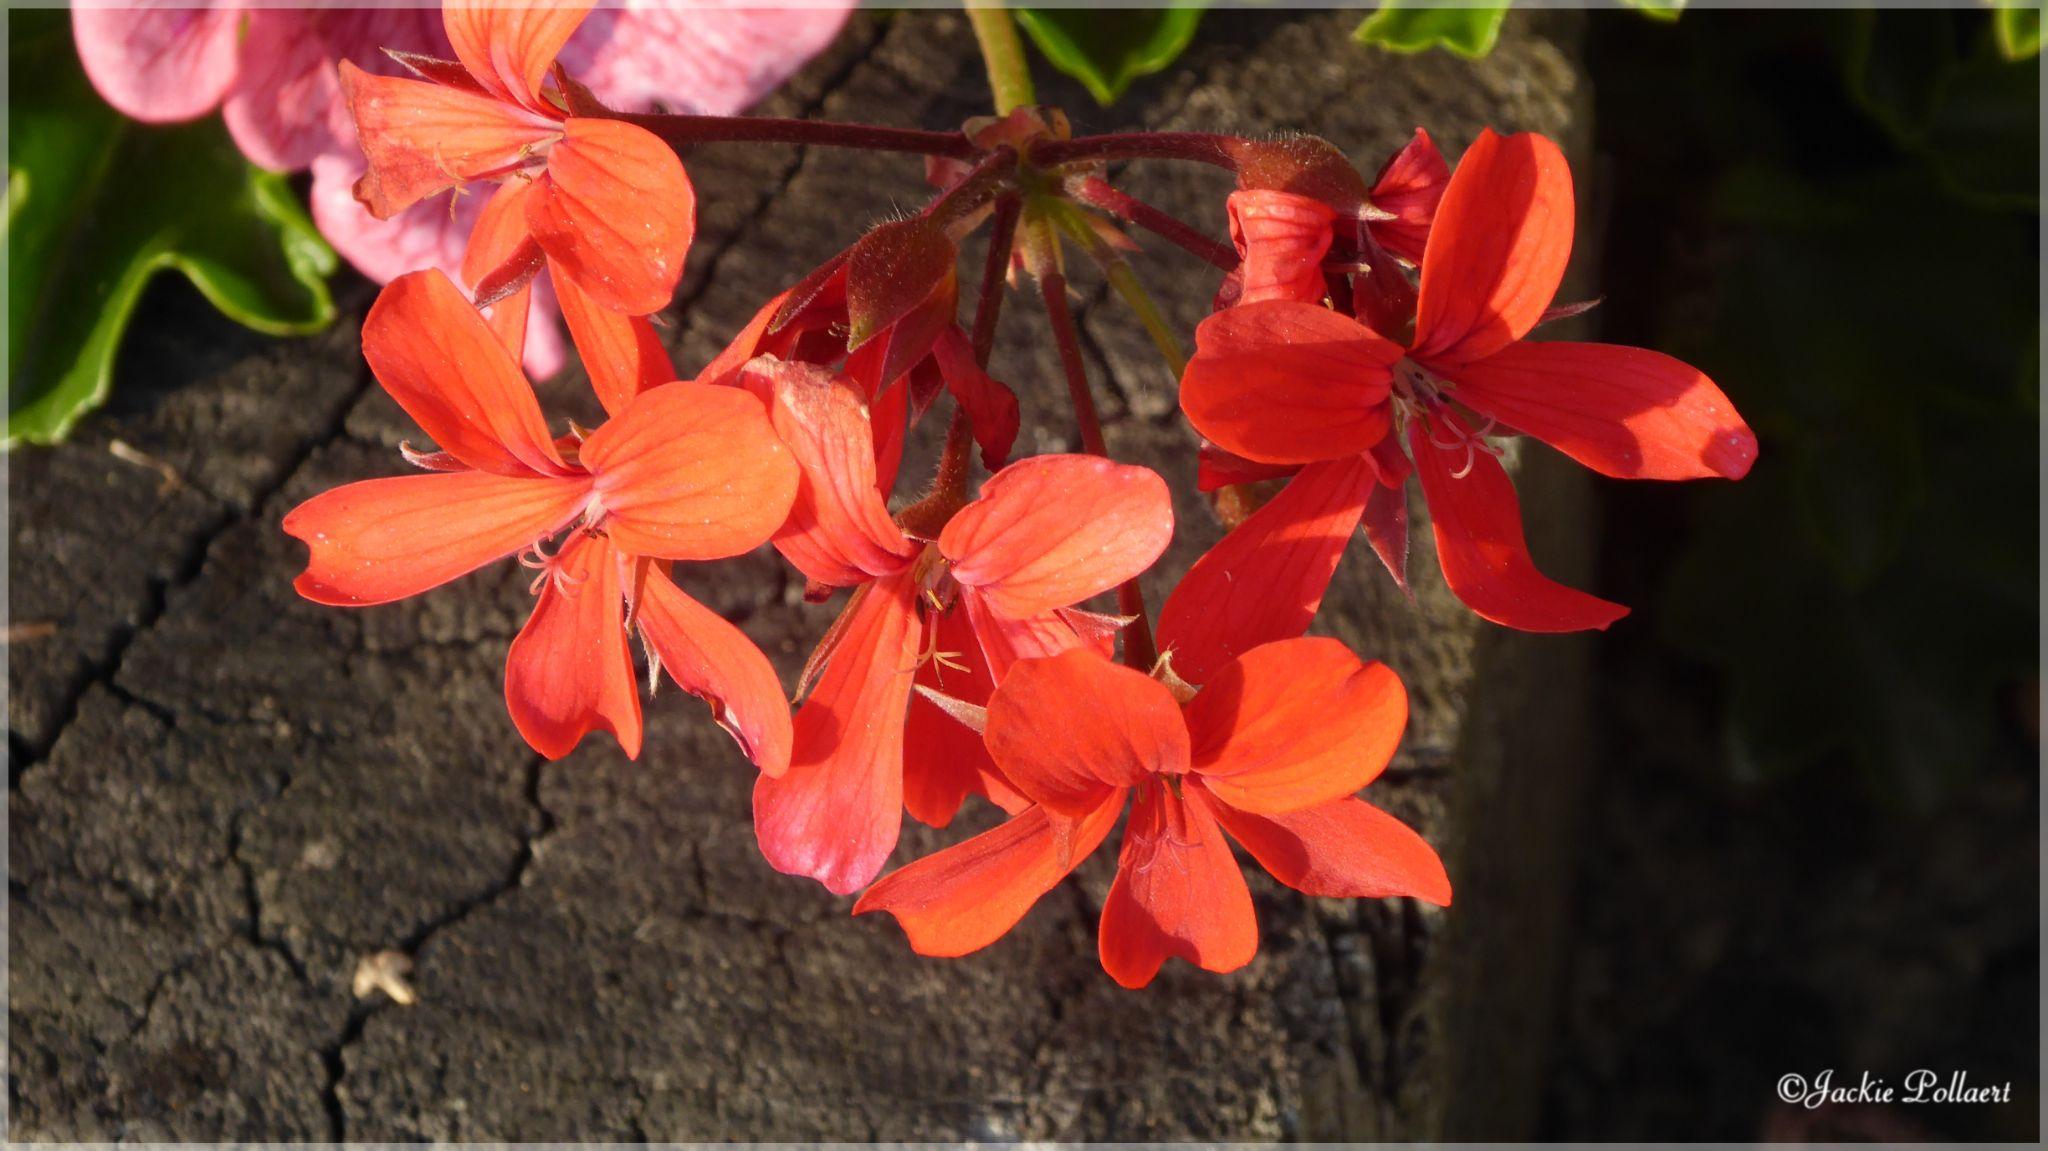 Fleurs geranium - Flowers geranium by Jackie Pollaert